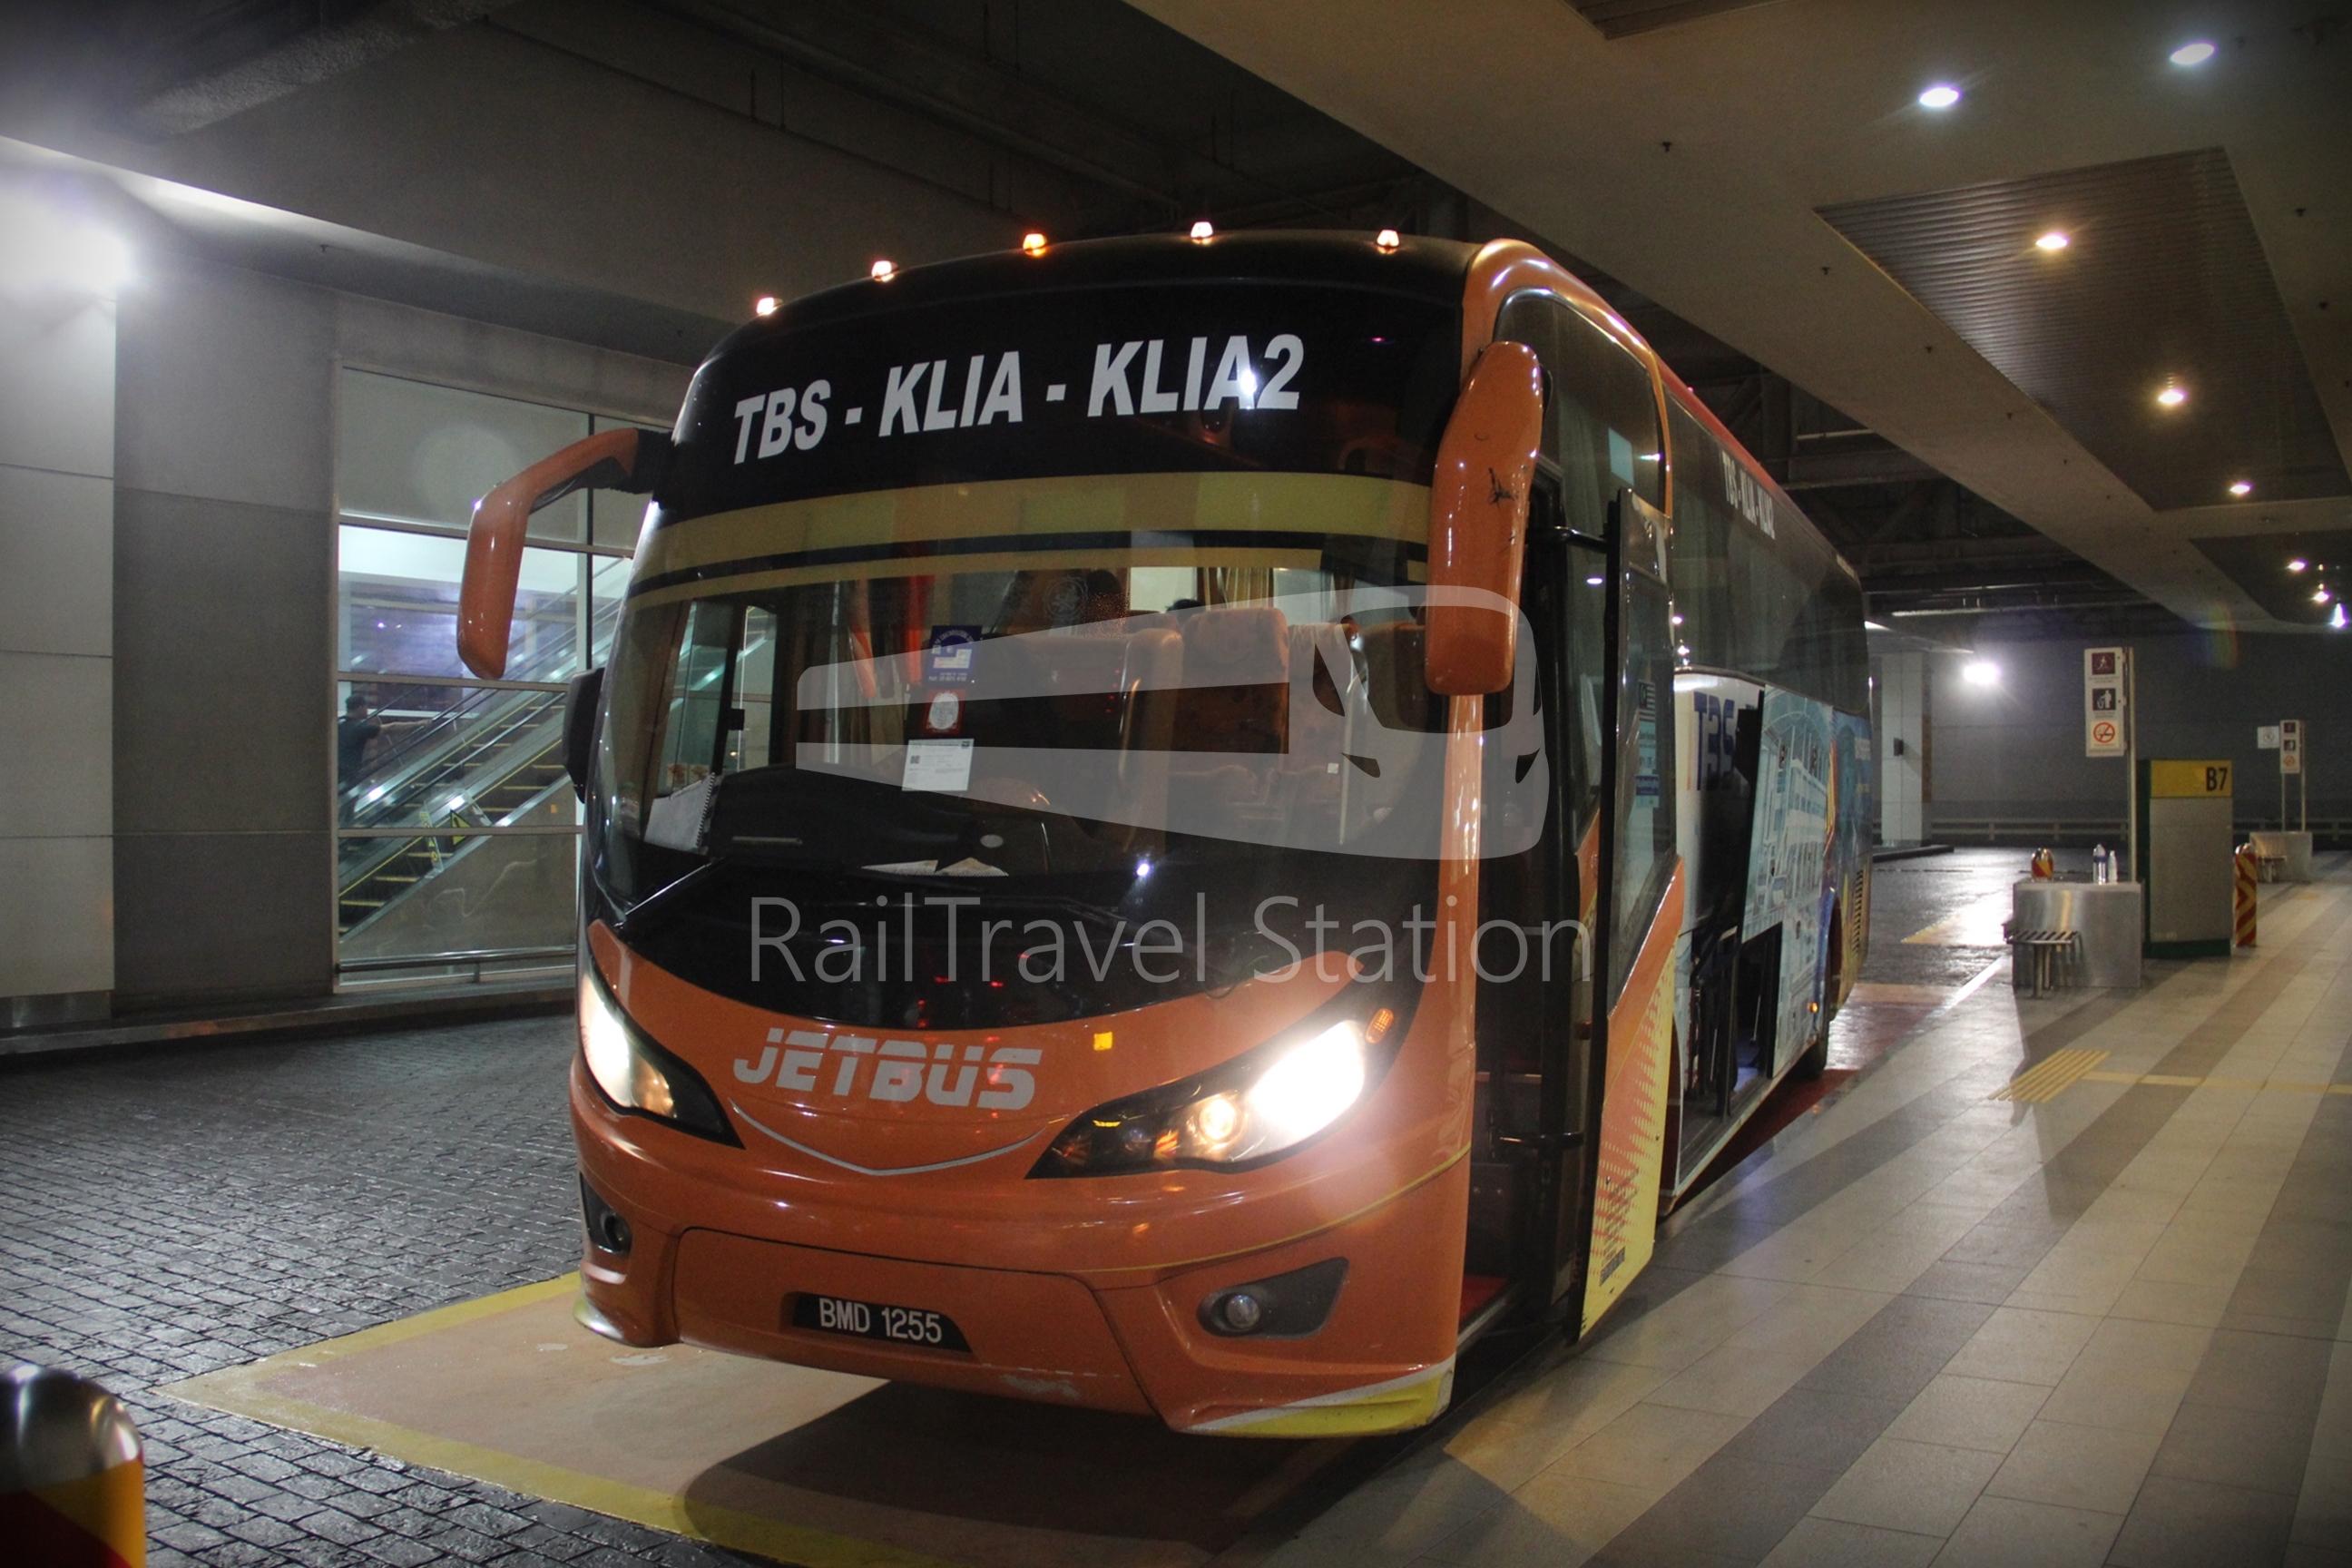 Jetbus Terminal Bersepadu Selatan Tbs To Klia2 And Klia